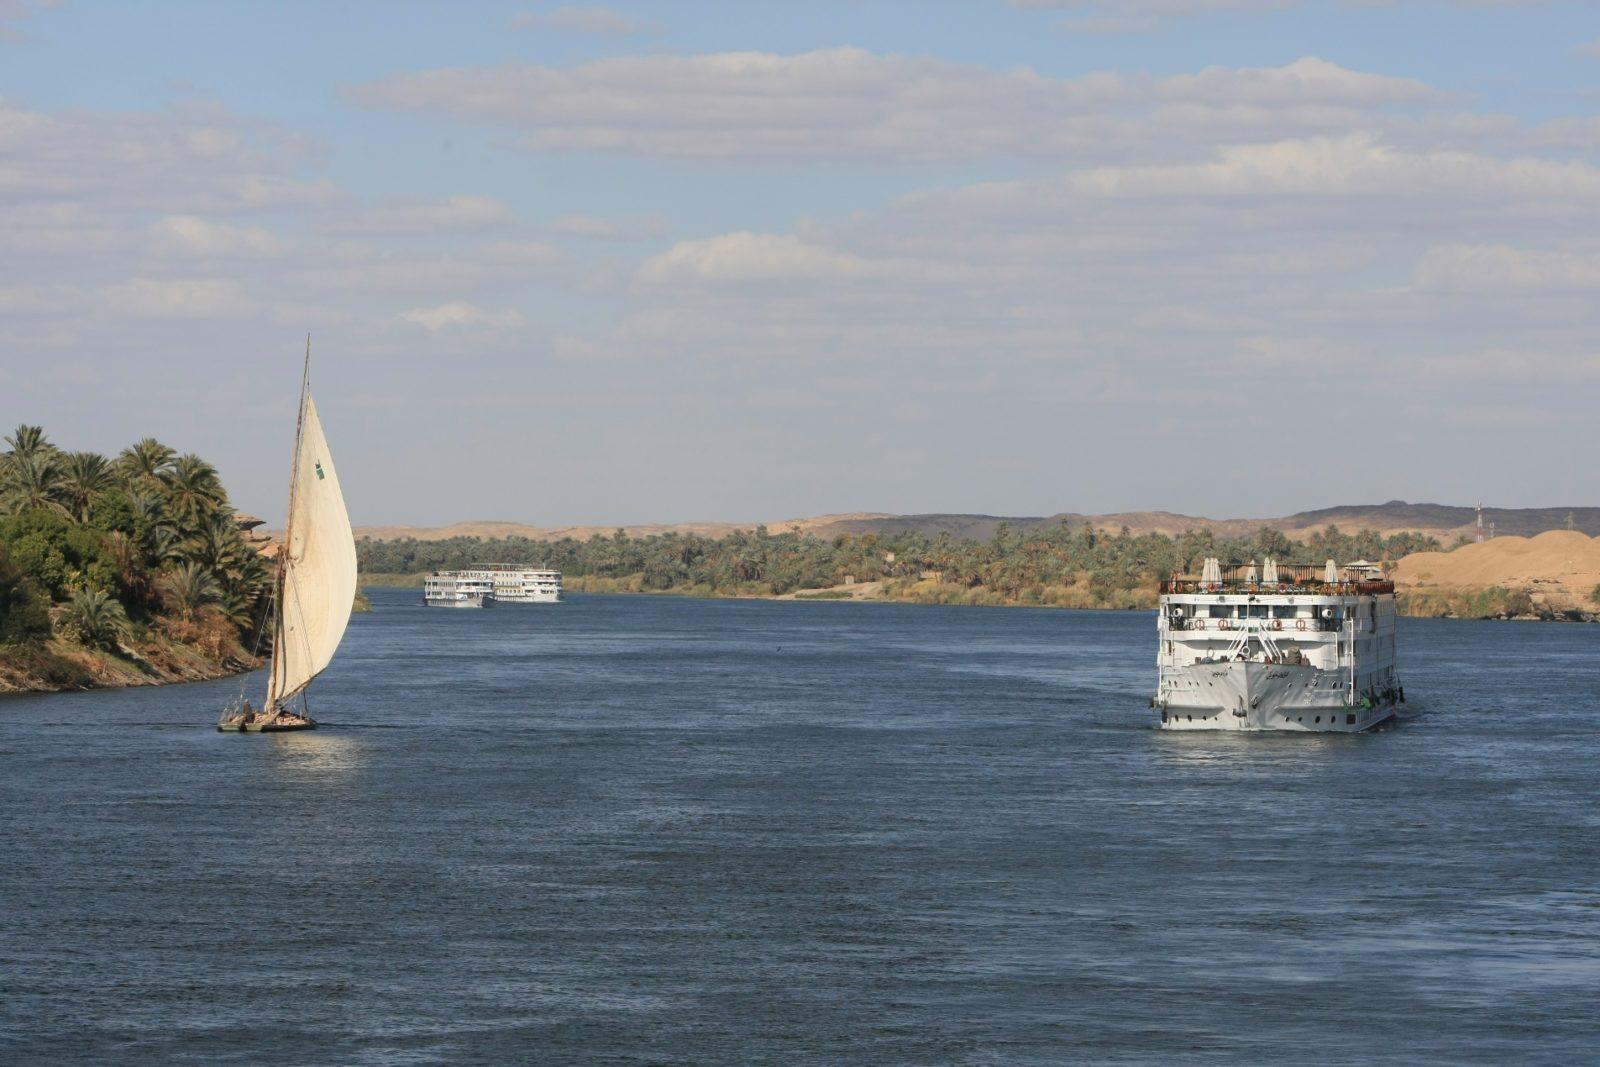 Sails & Boat